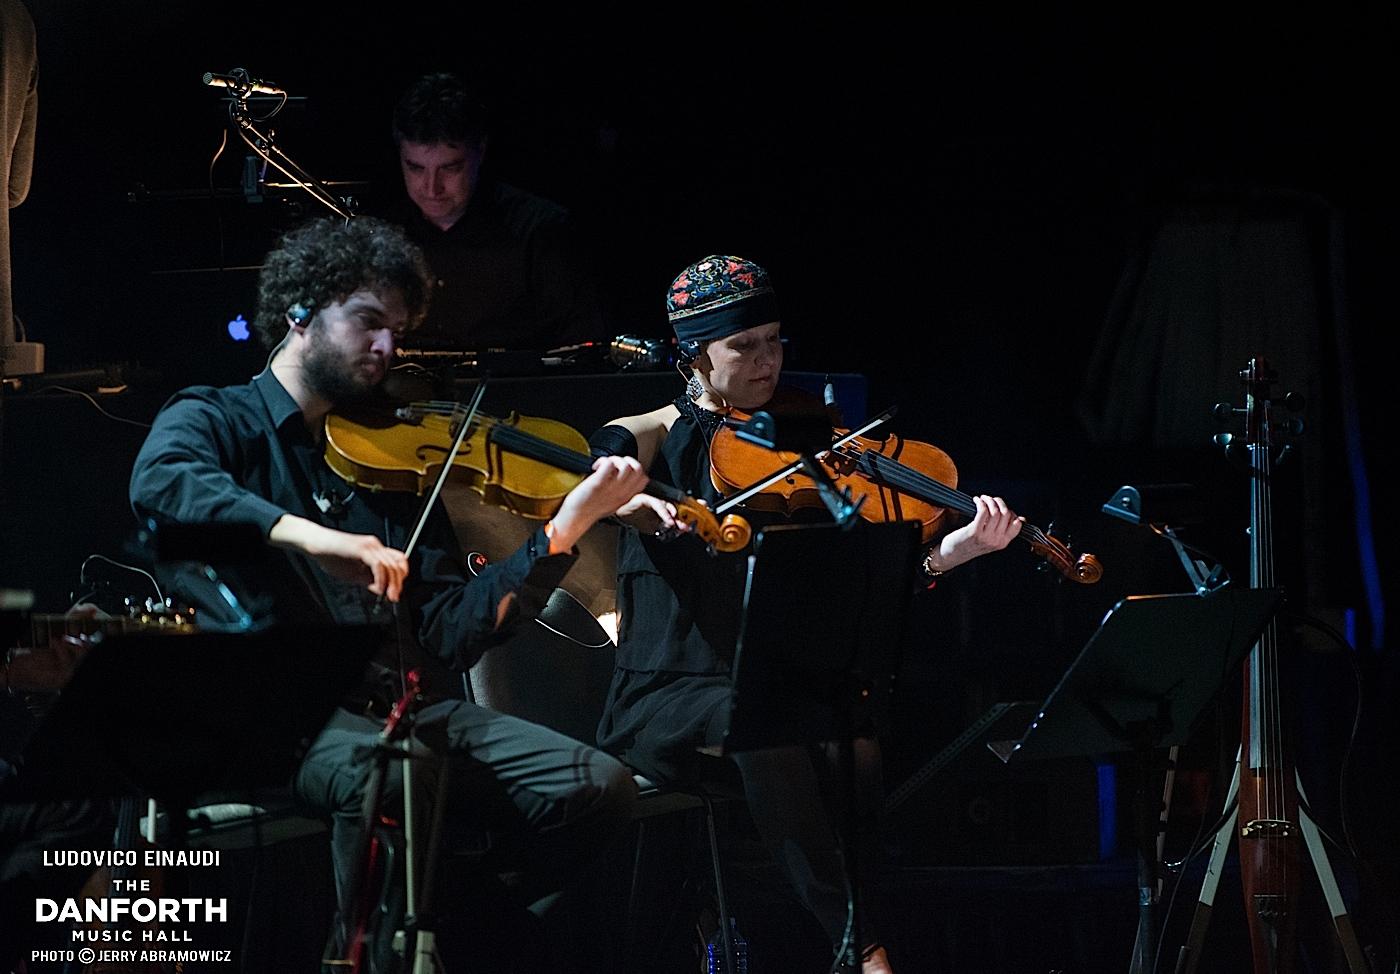 20130517 Ludovico Einaudi performs at The Danforth Music Hall Toronto 0125